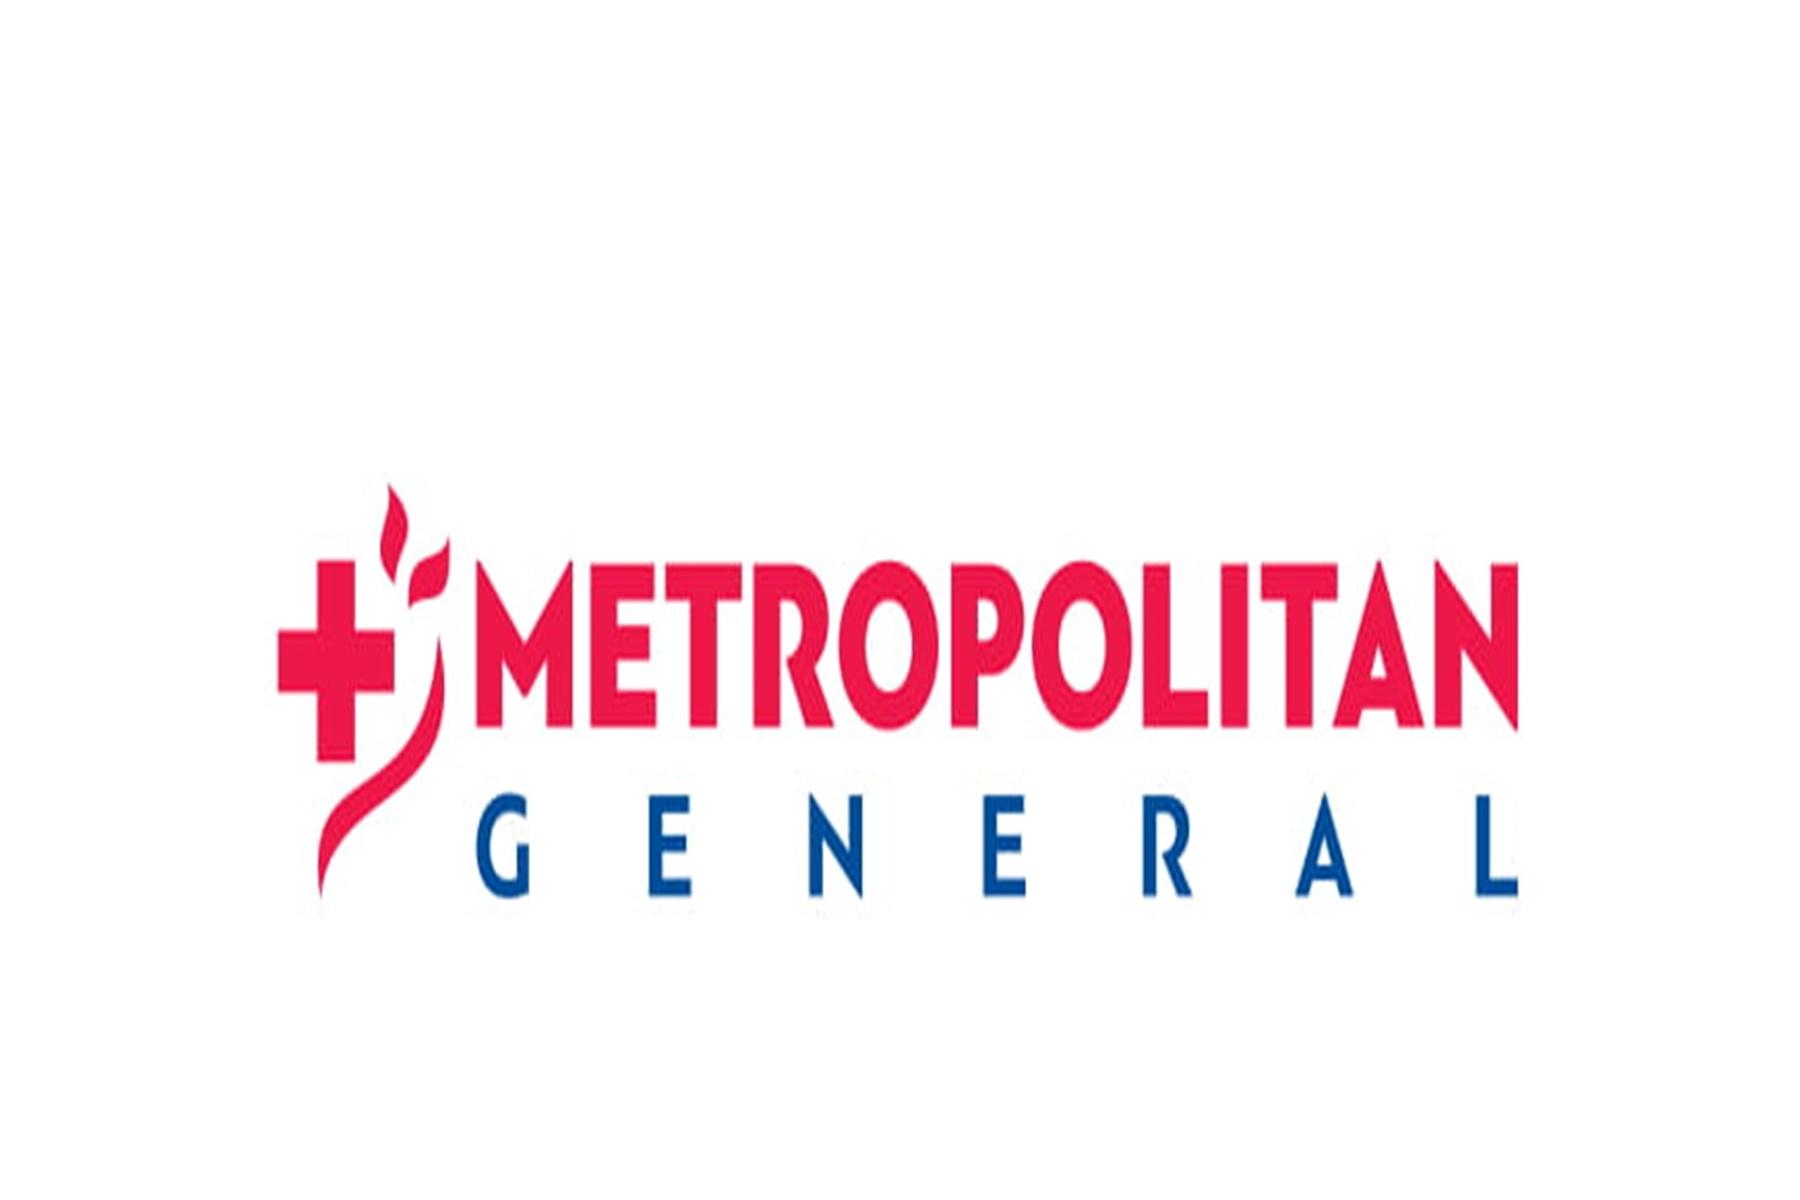 Metropolitan general : Παρέχει διατροφική φροντίδα στους ασθενείς